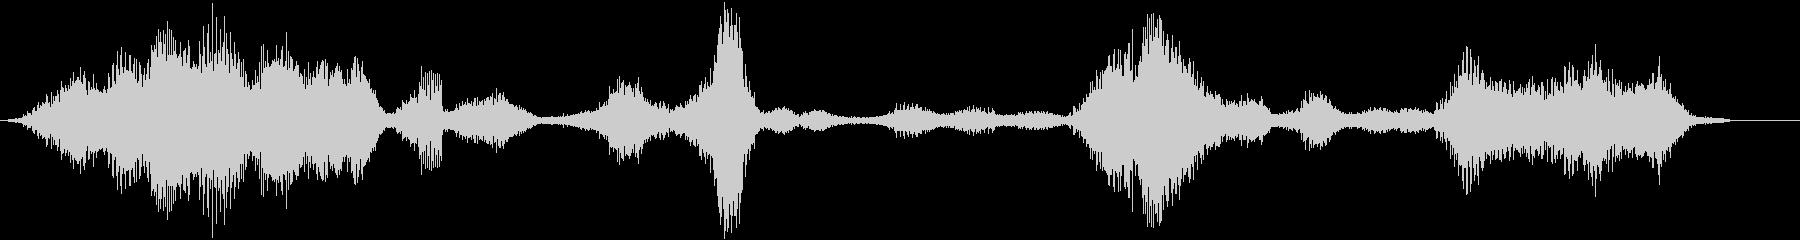 ELECTRO VOCALクリーチ...の未再生の波形